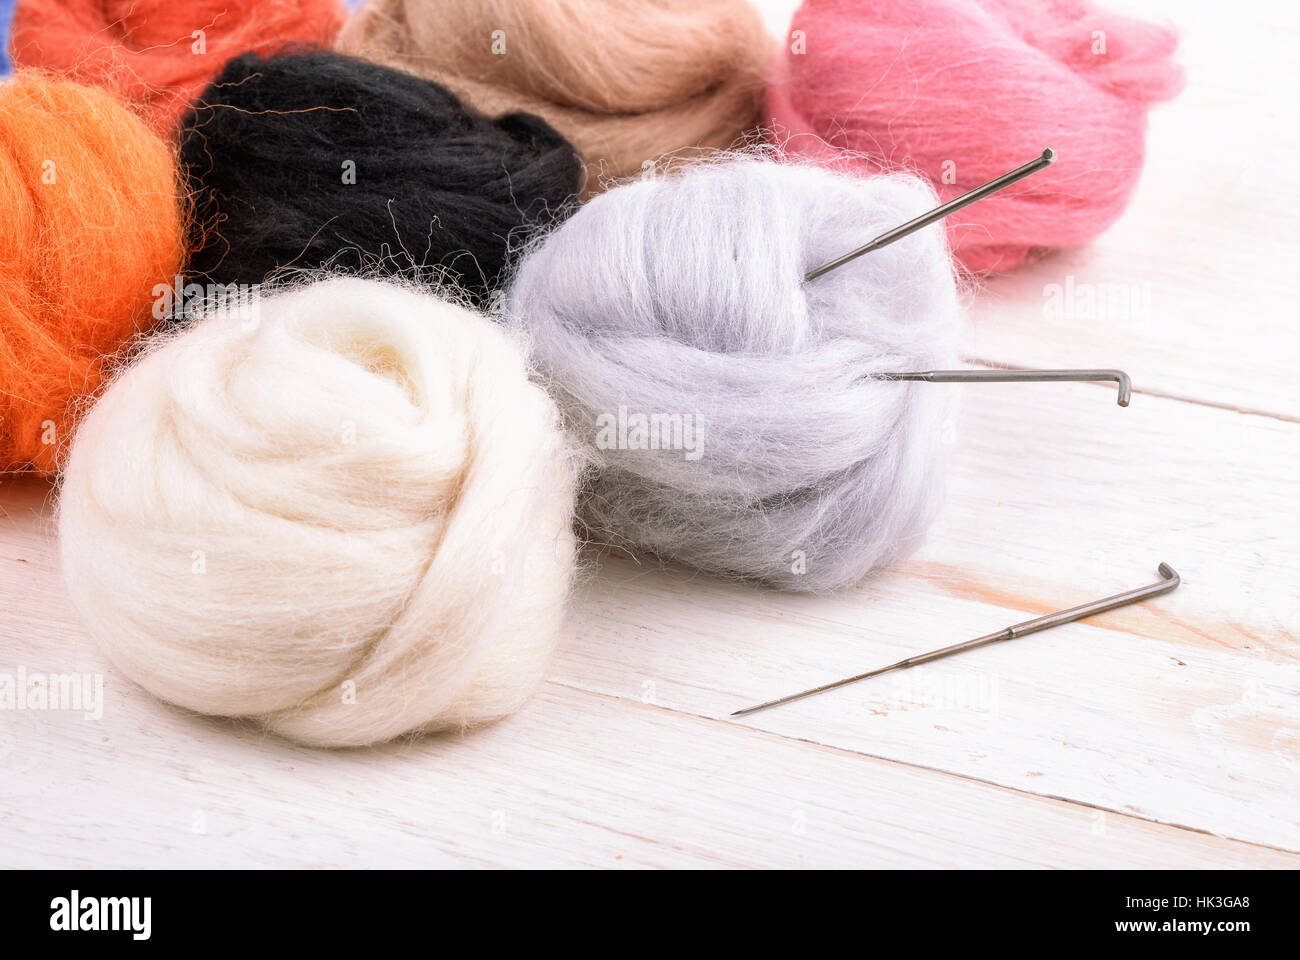 Close up of wool needle felting kit on wooden surface - Stock Image